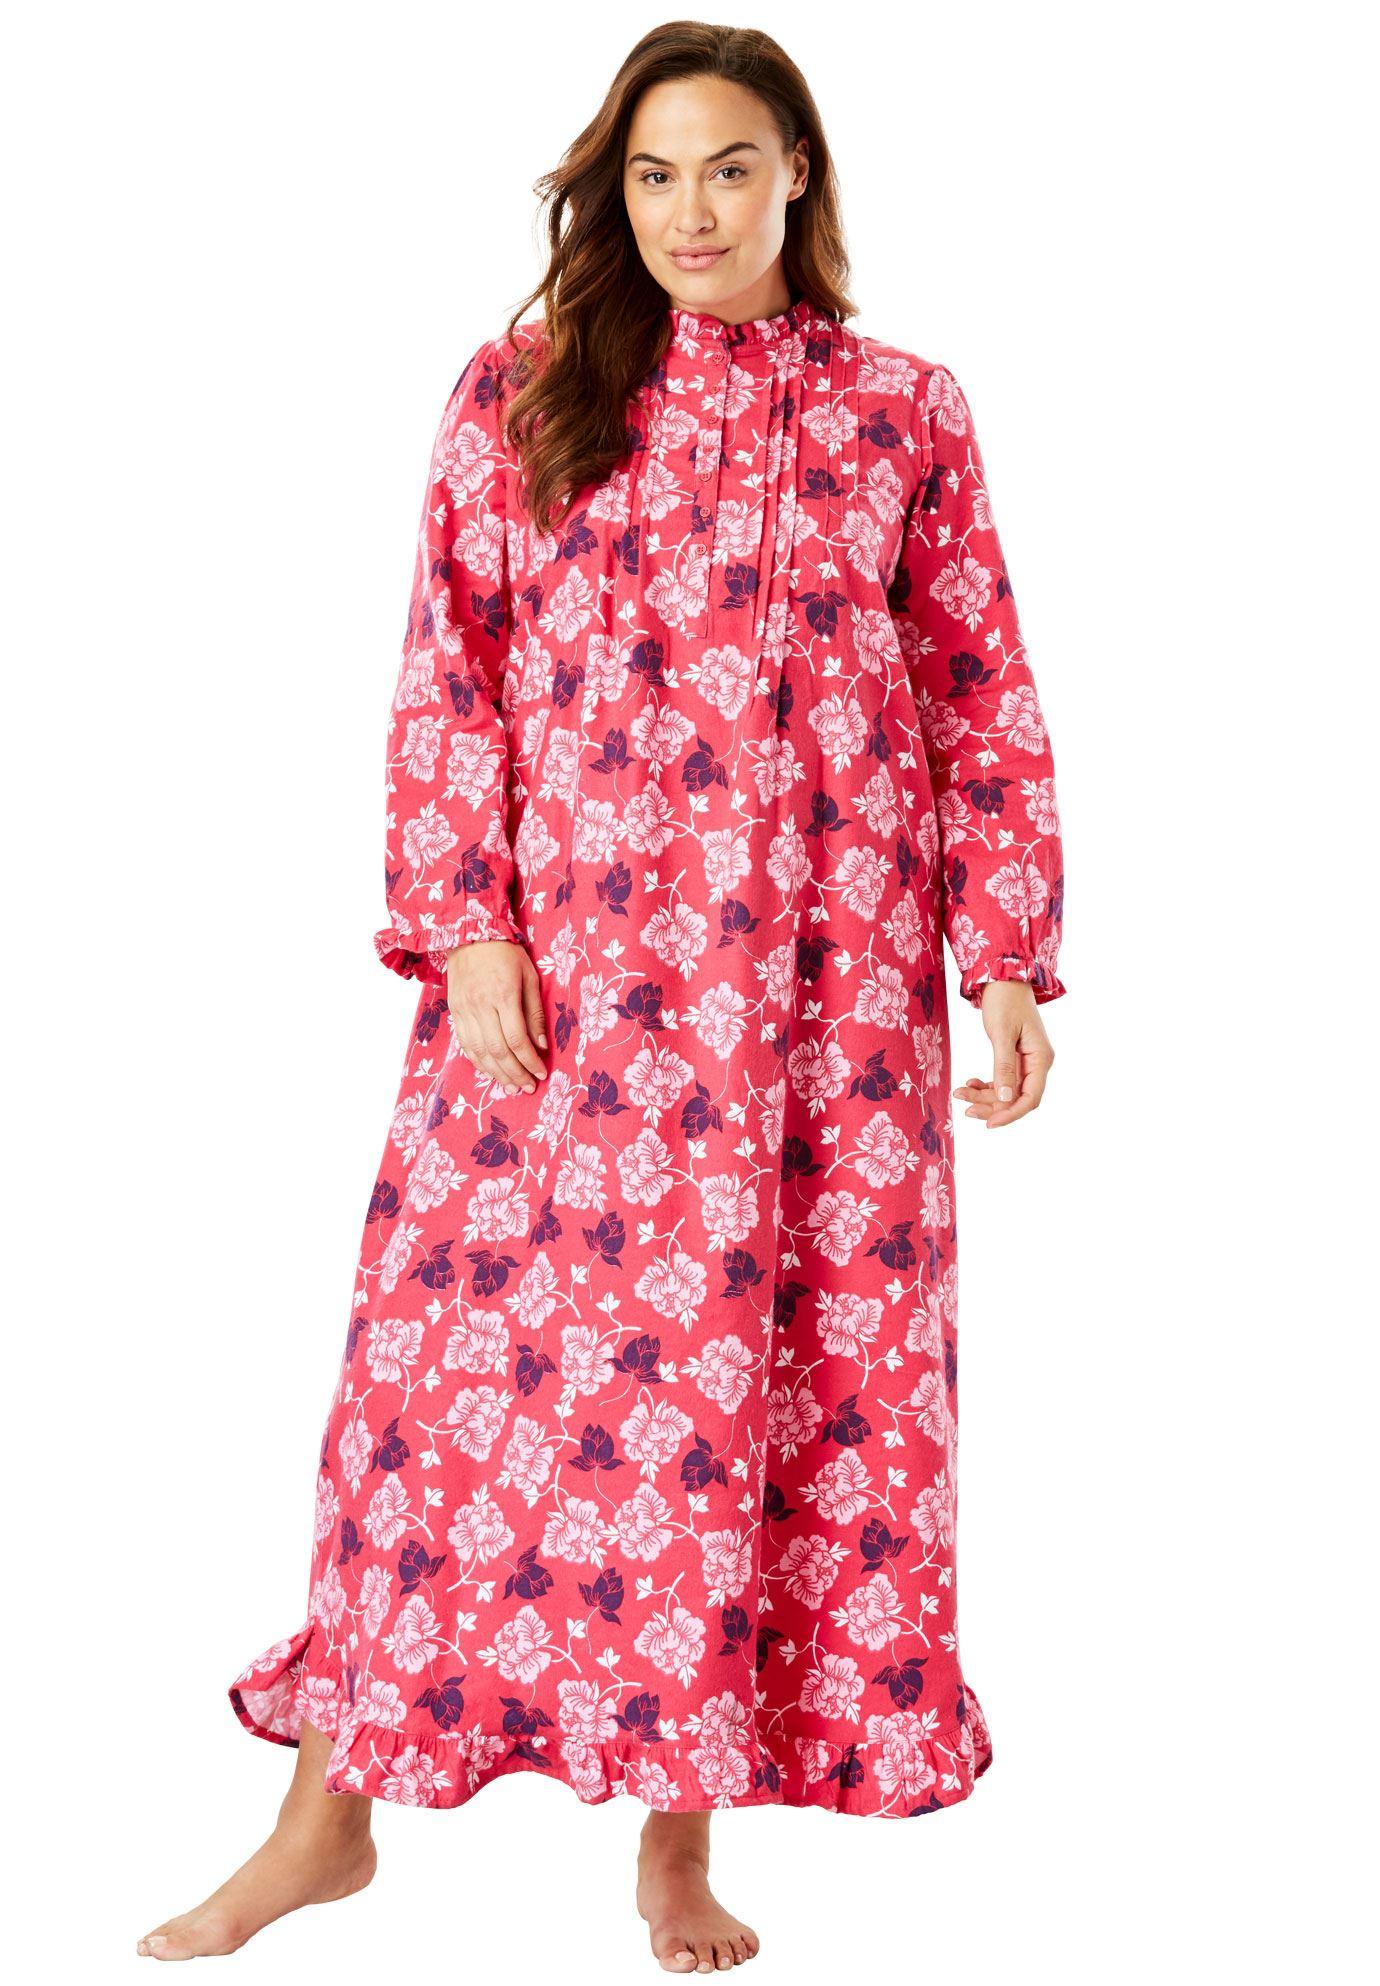 Womens Plus Nightshirts Gowns Walmartcom